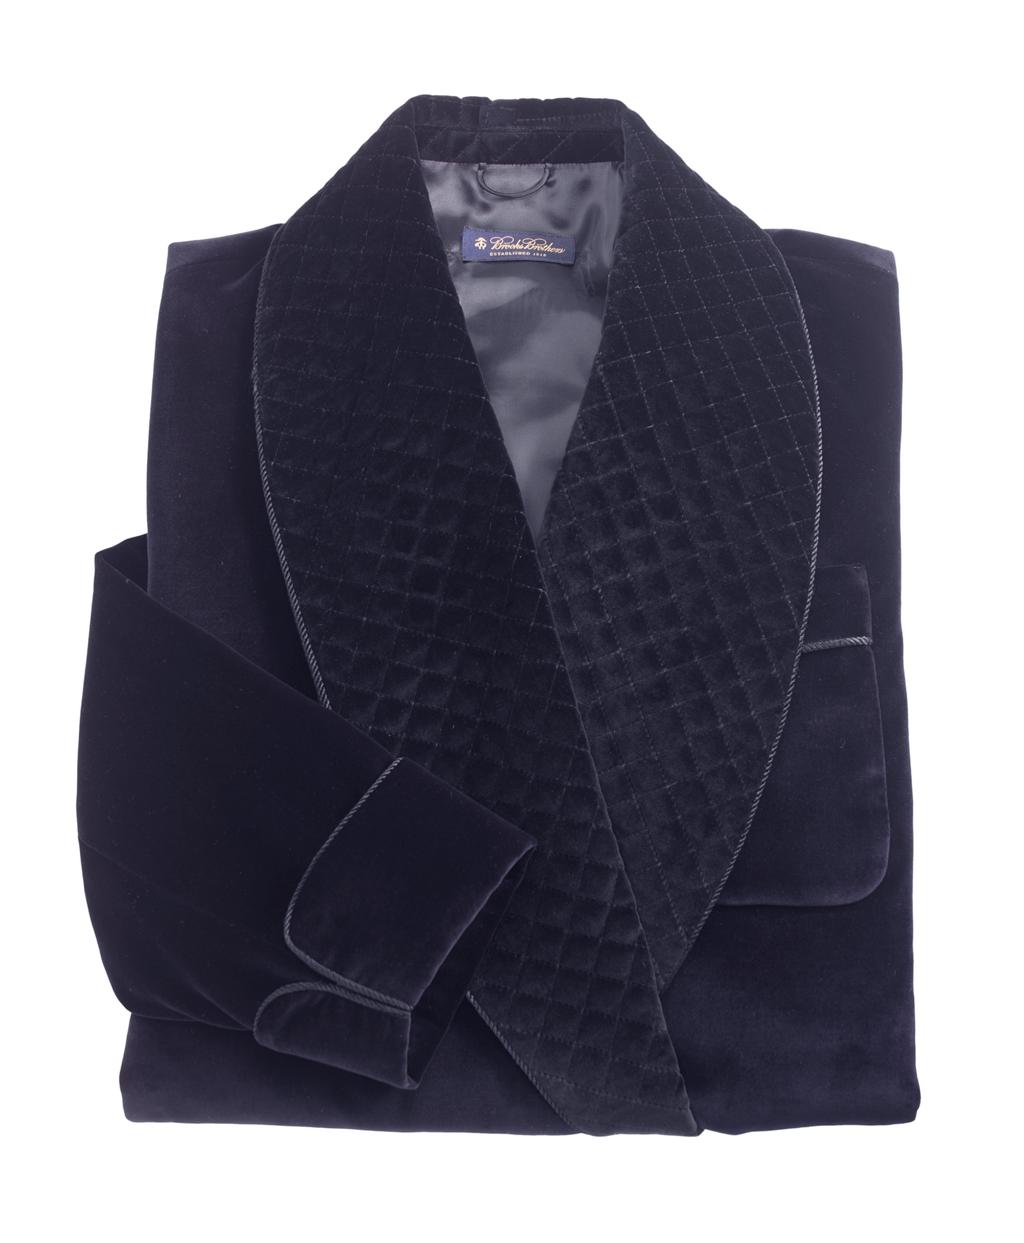 Men s Velvet Smoking Jacket 0fc60465c1